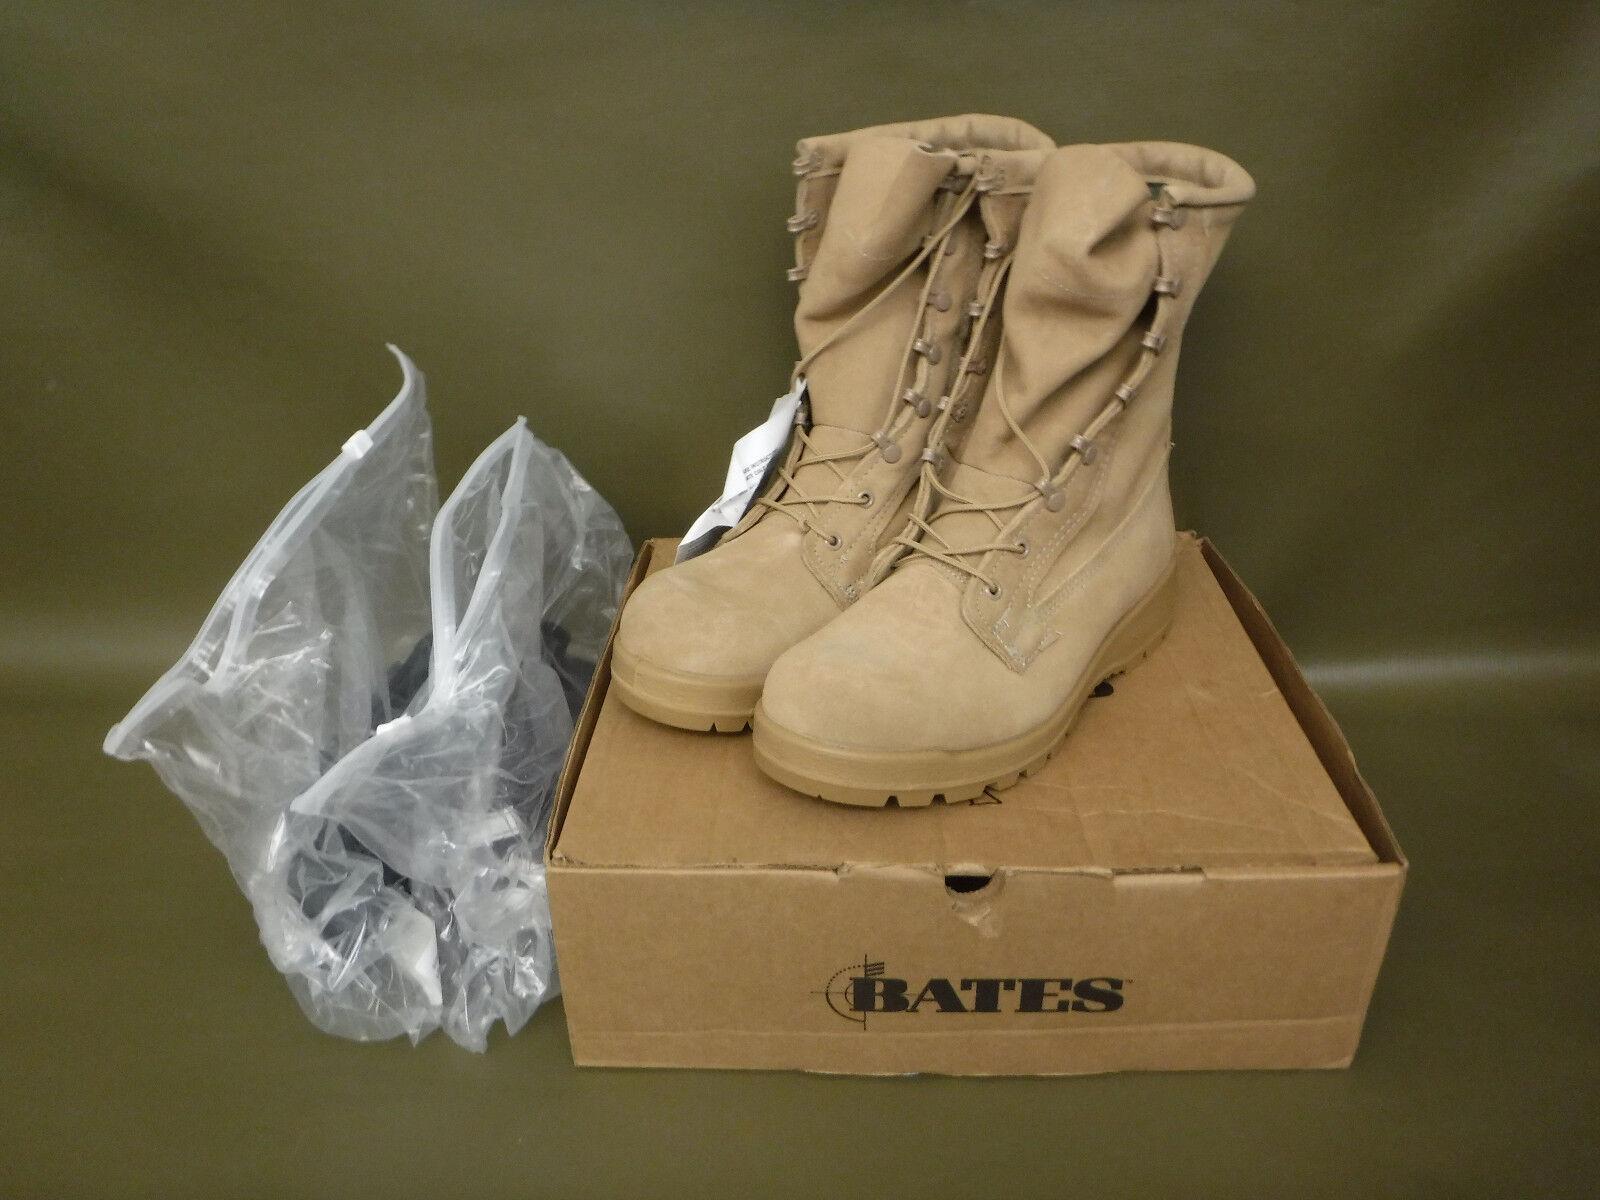 Bates 9R 11461A Intermediate Cold/Wet Stiefel 9R Bates 8430-01-619-3472 b6b065